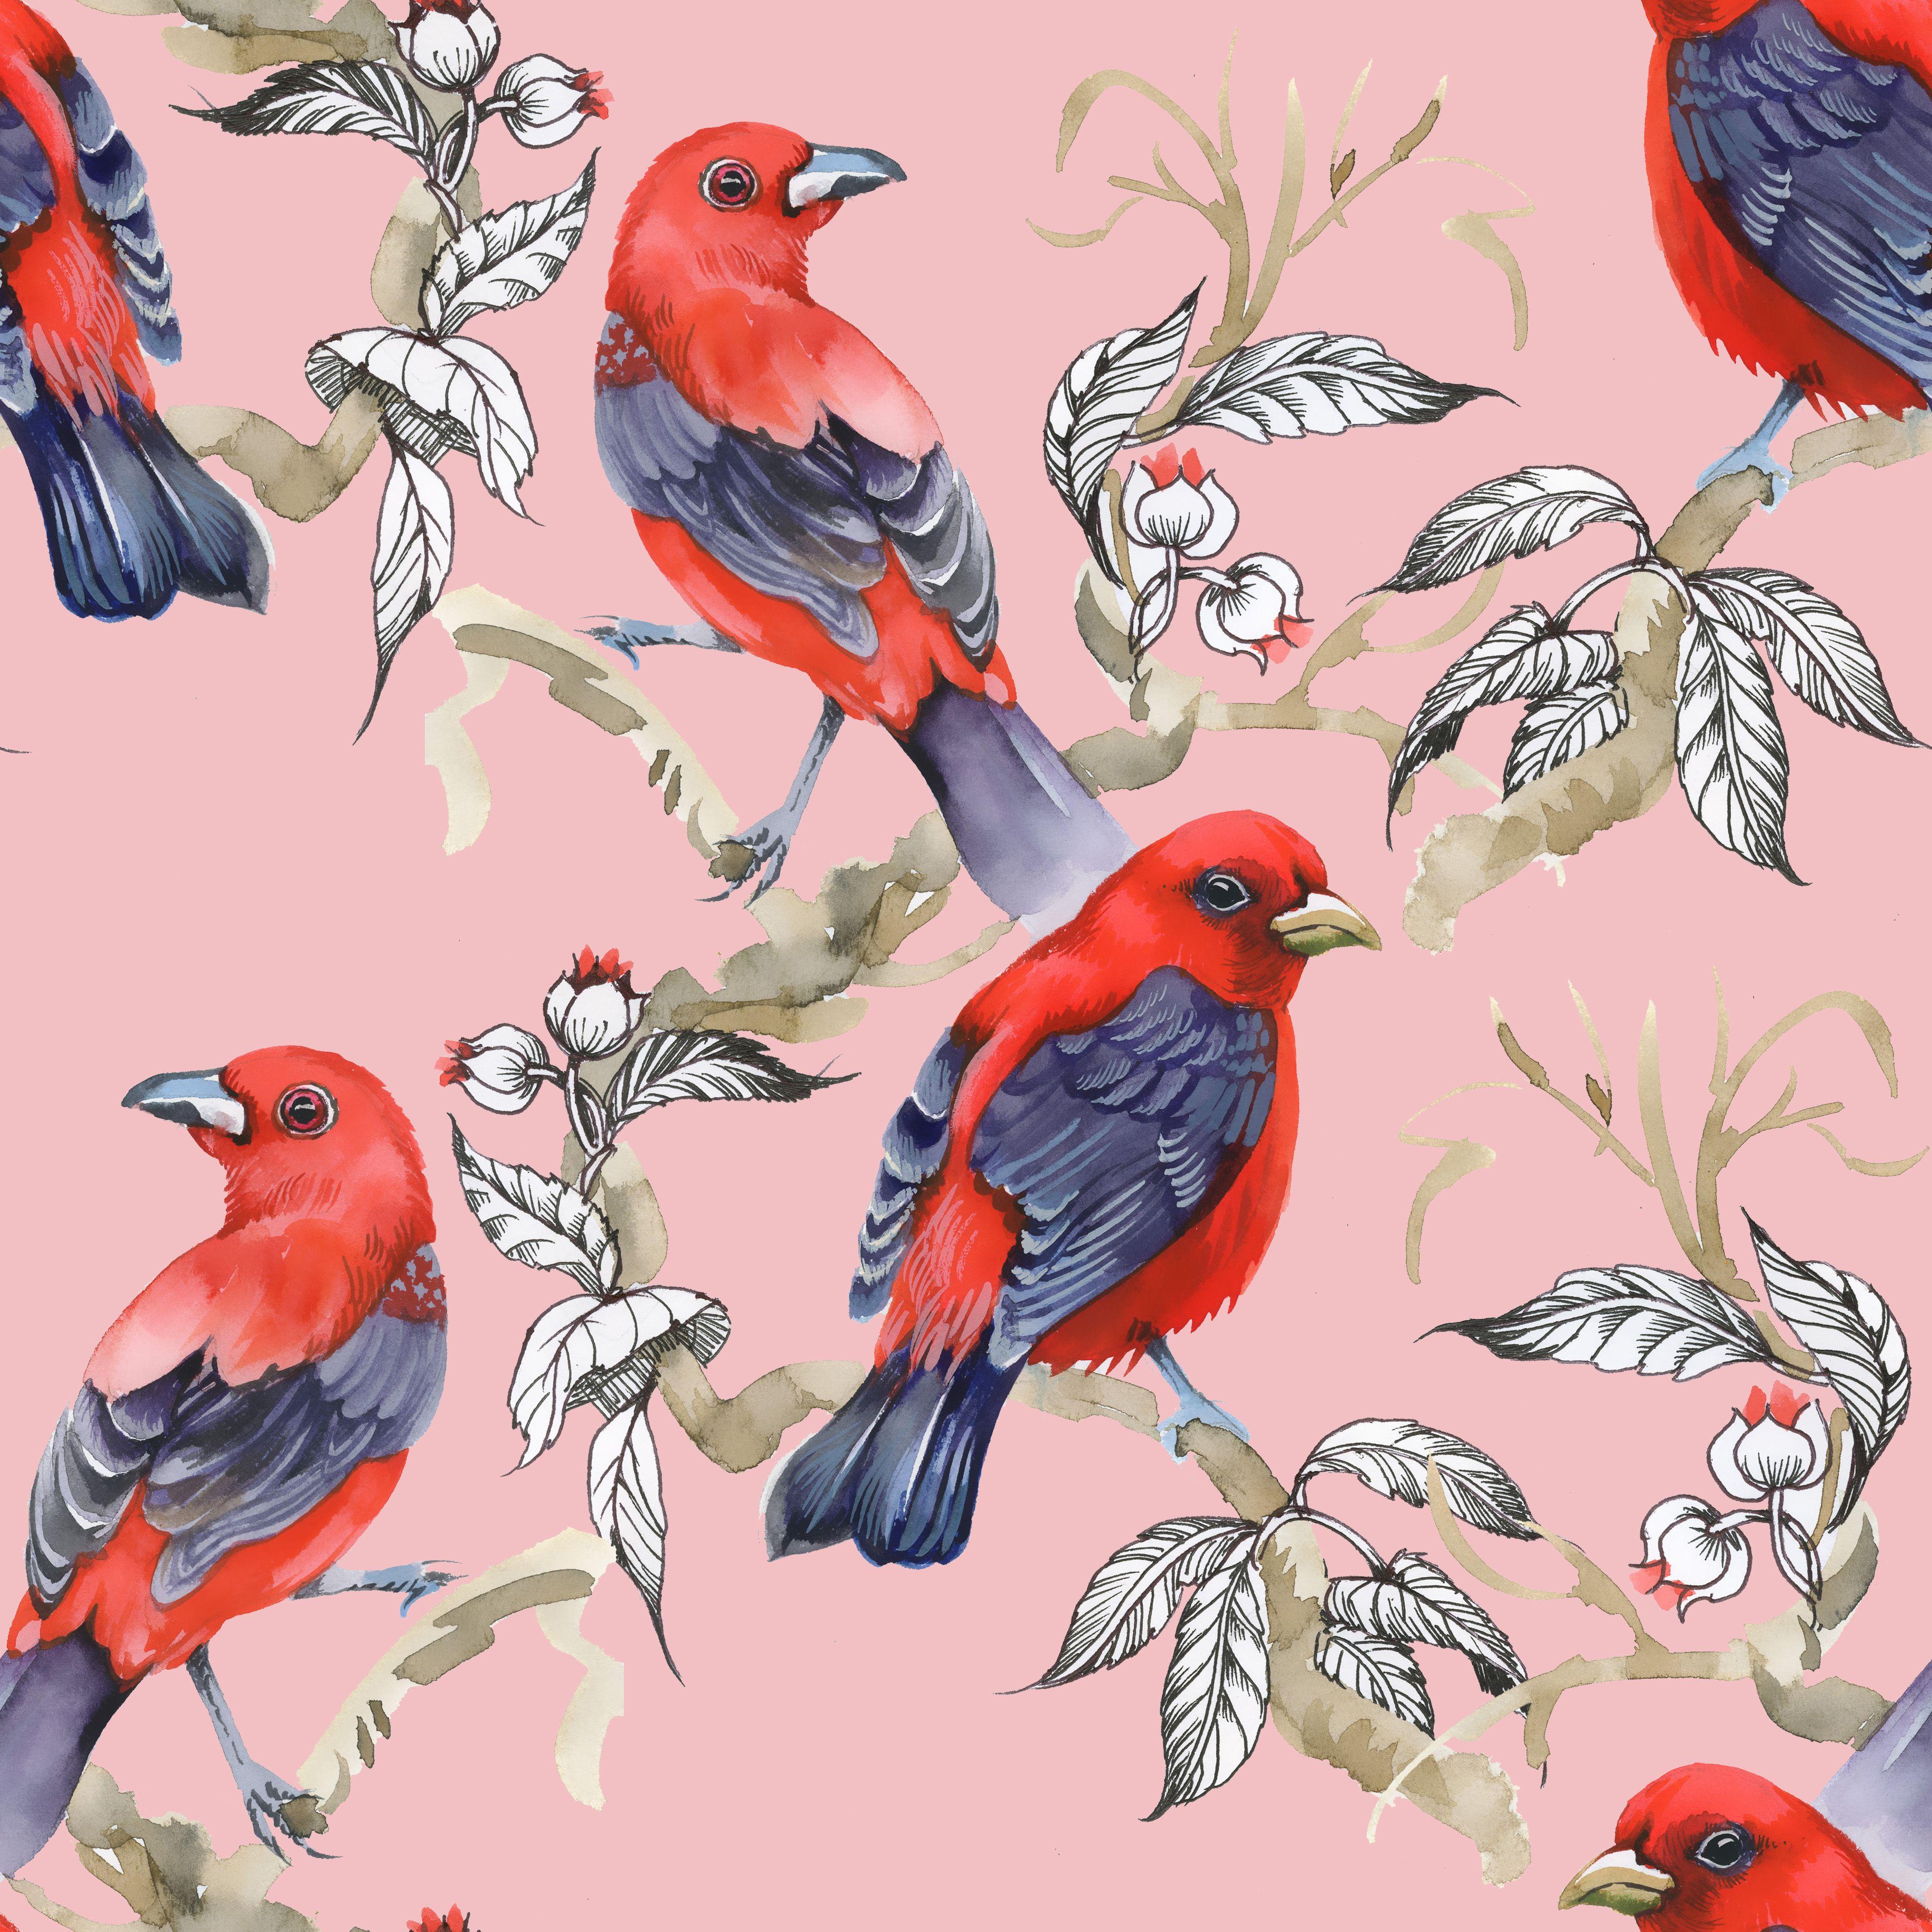 Pin by Hujushaikh on Mr.shaikh Floral, Textiles, Rooster